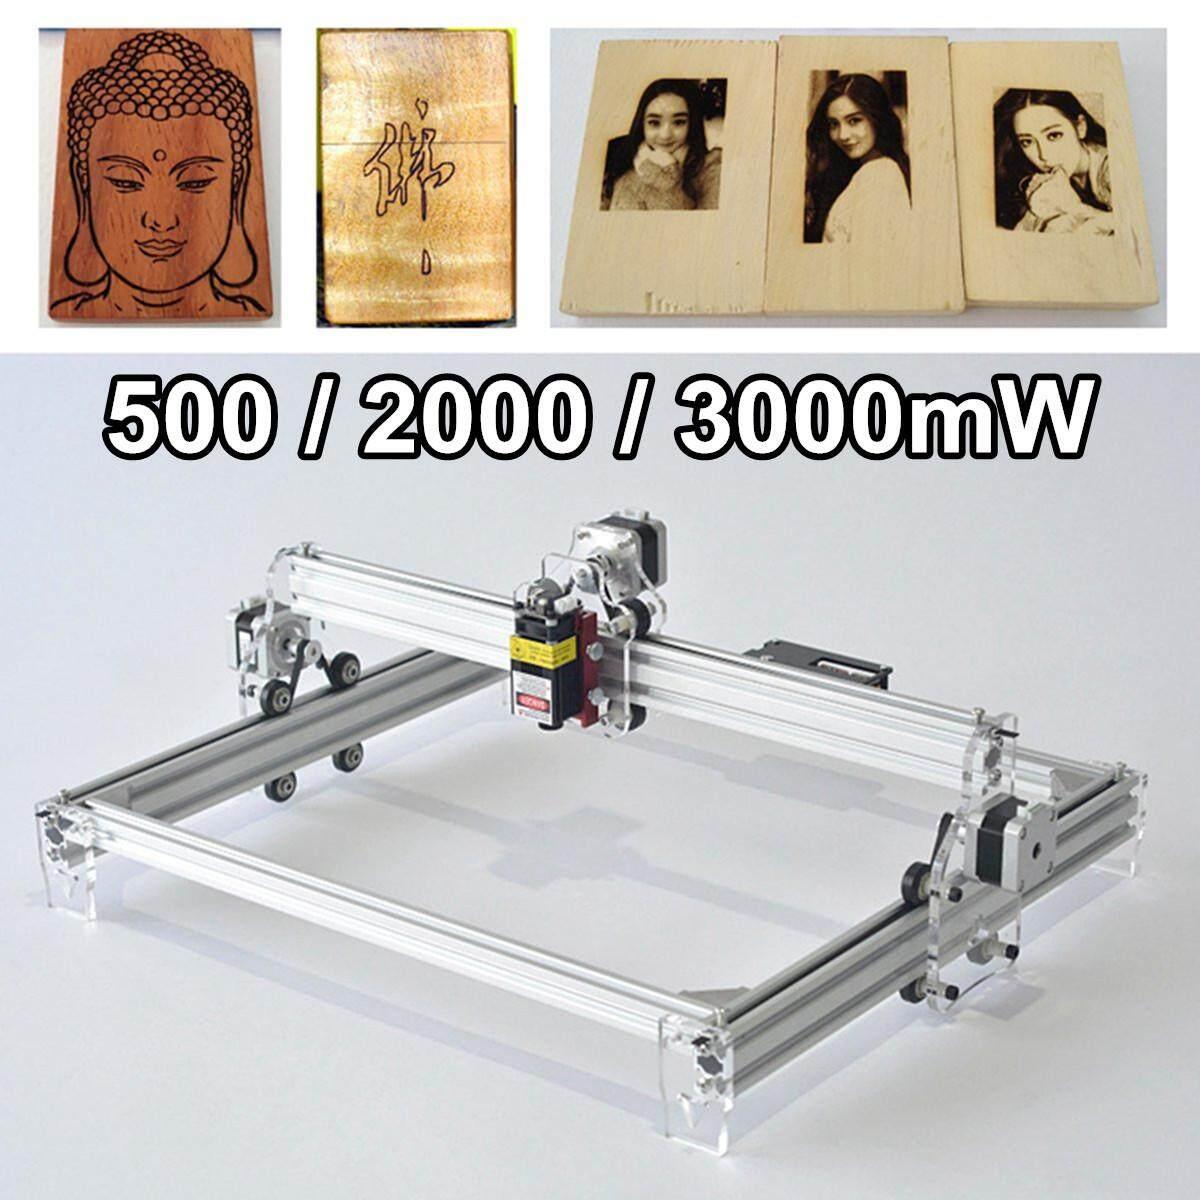 DIY Desktop cnc router Metal laser cutter engraving machine USB engraver #  3000mw